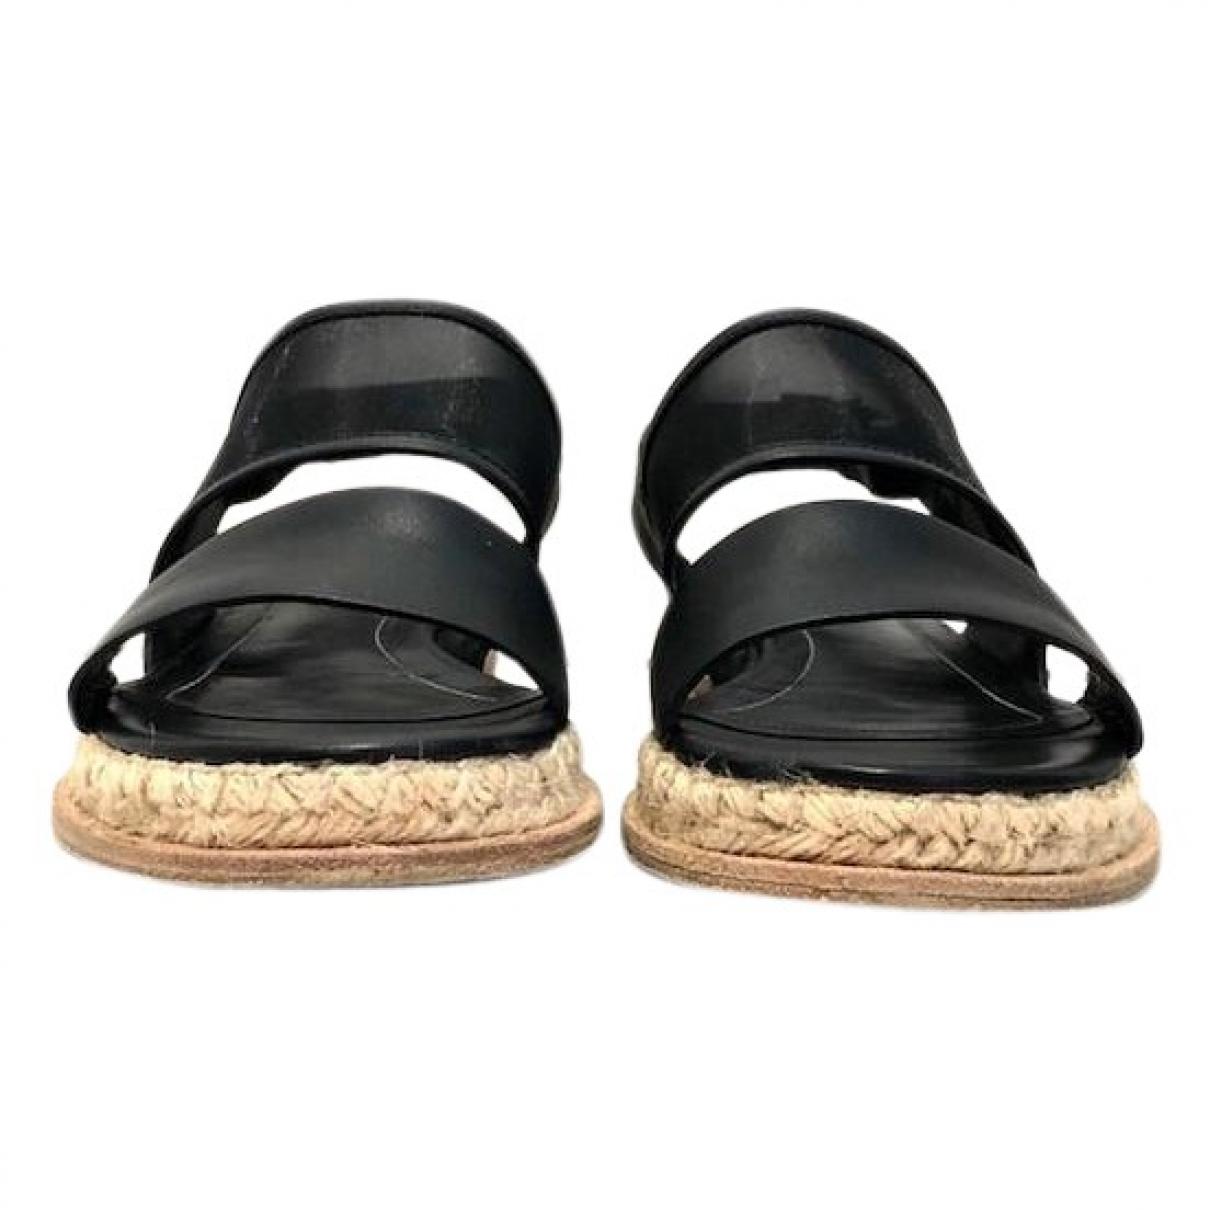 Balenciaga \N Black Leather Sandals for Women 39 EU